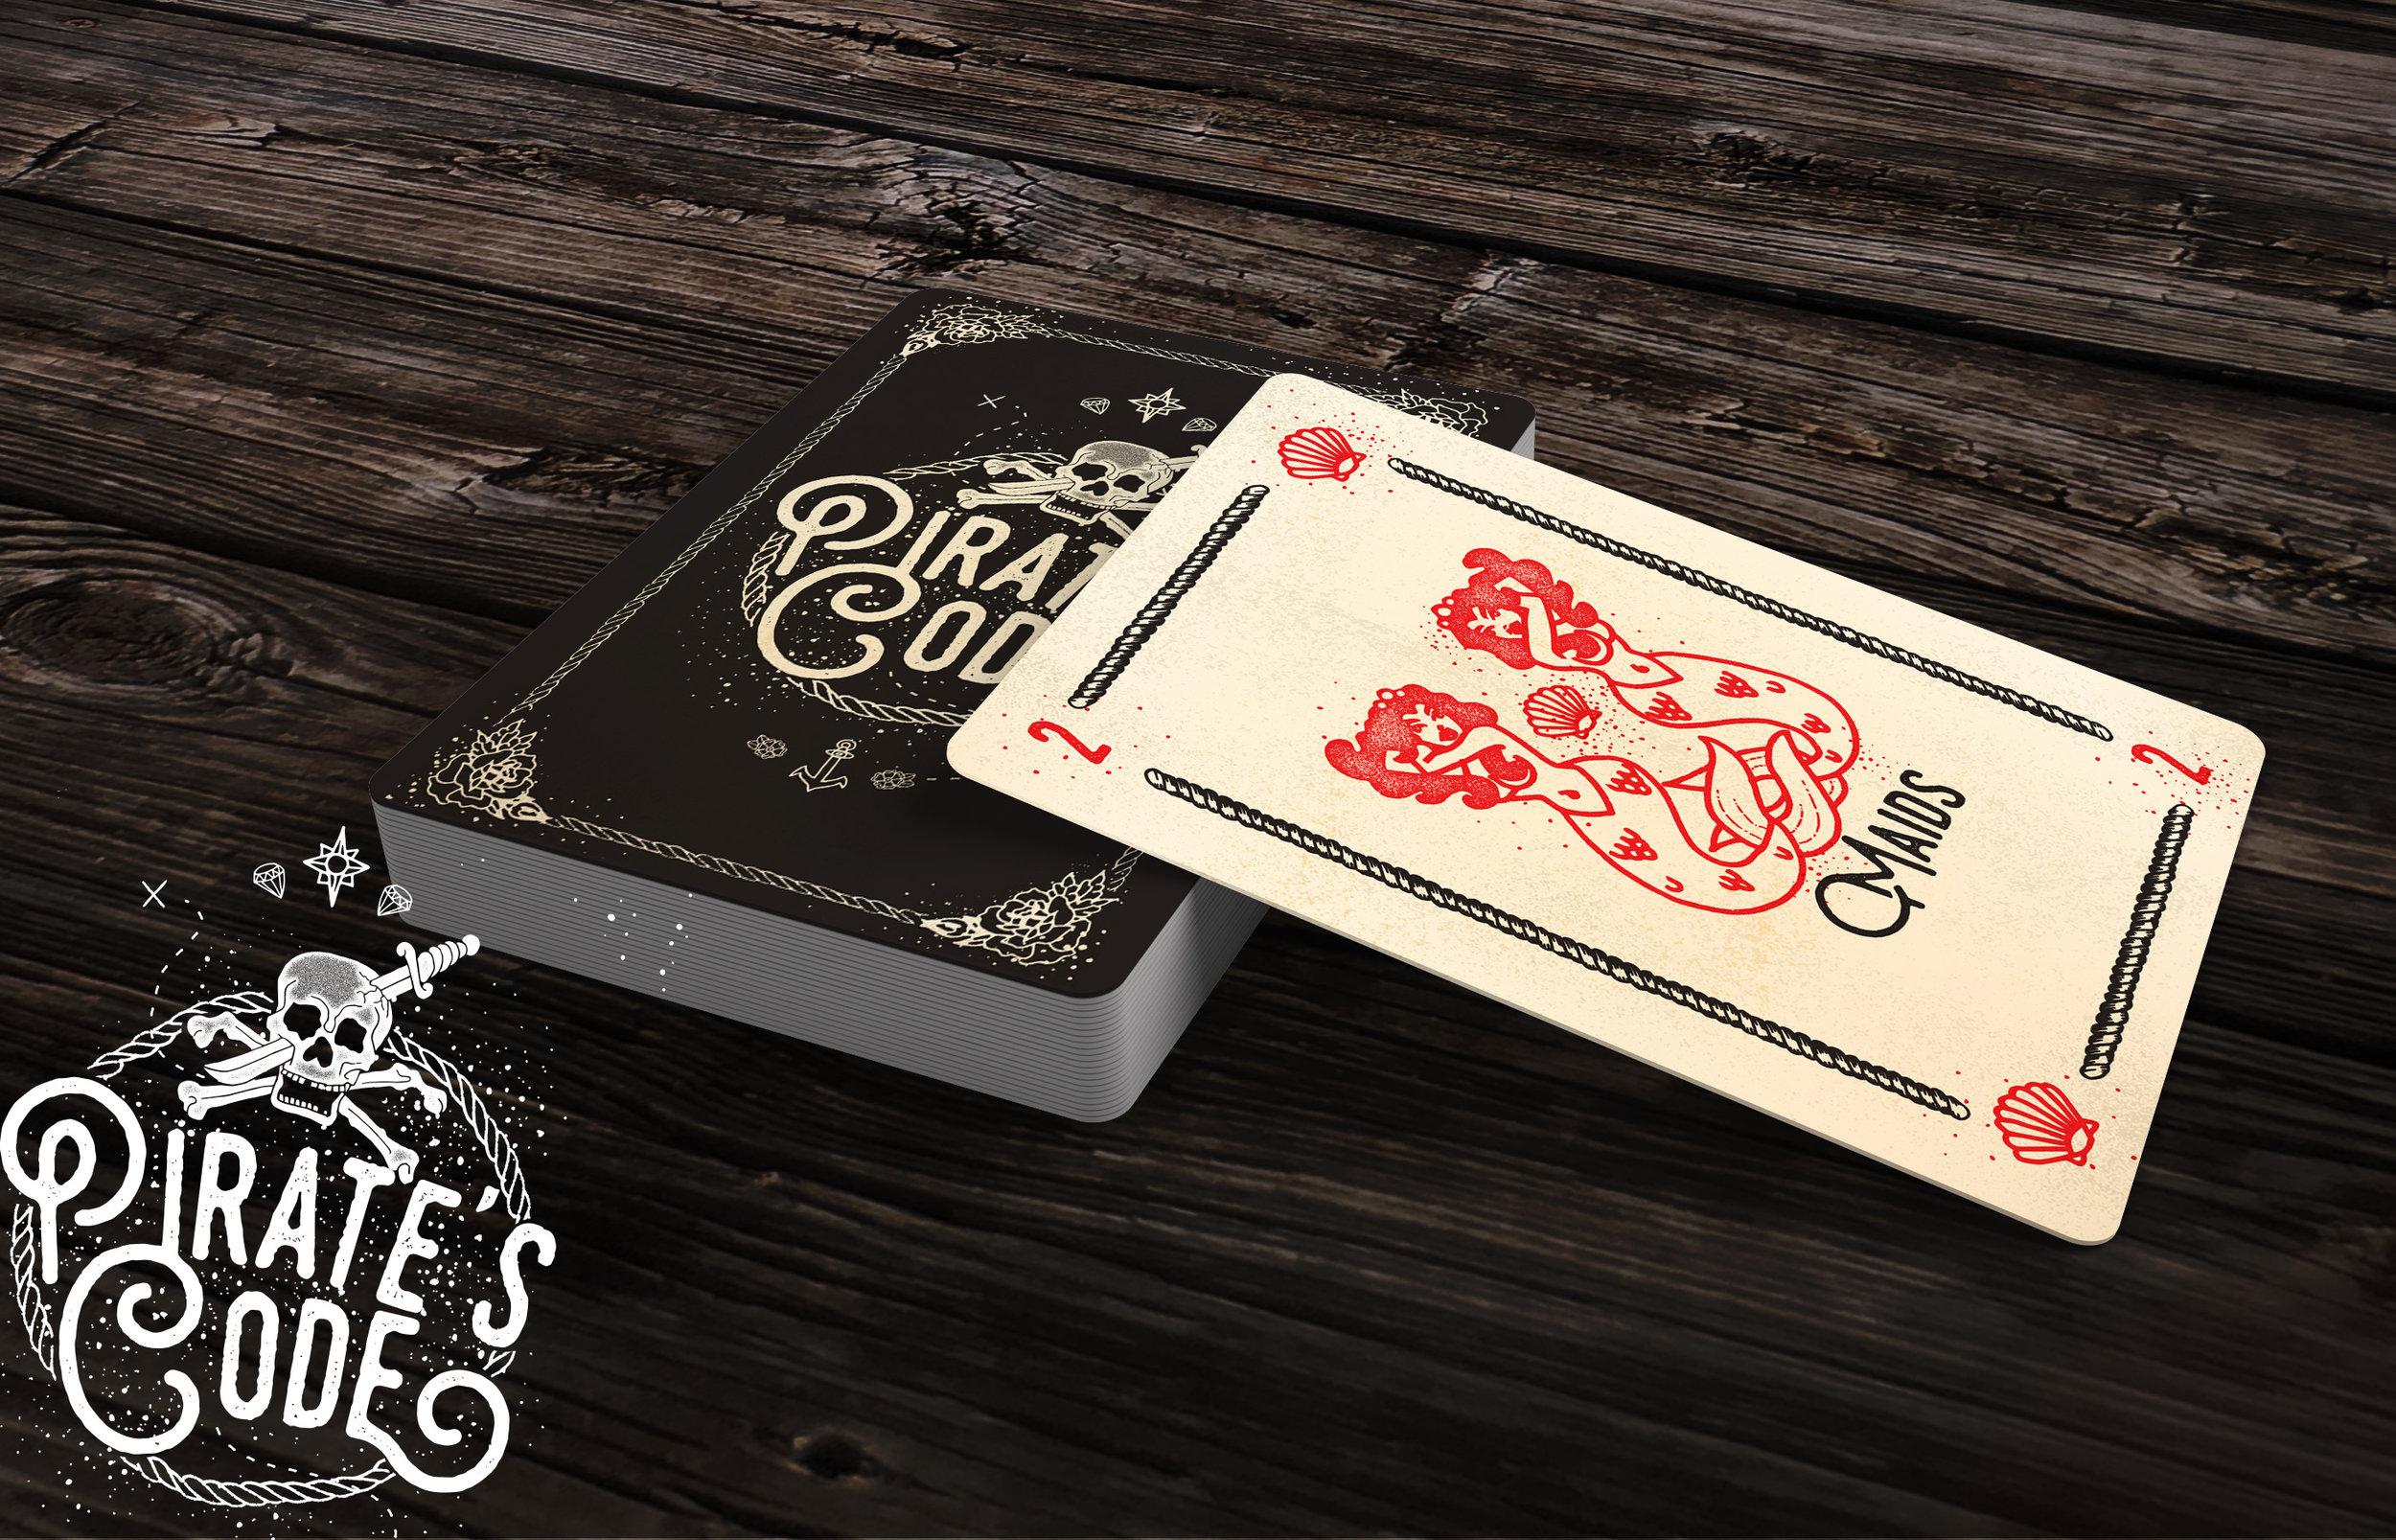 PiratesCode_CardGame_Mockup.jpg